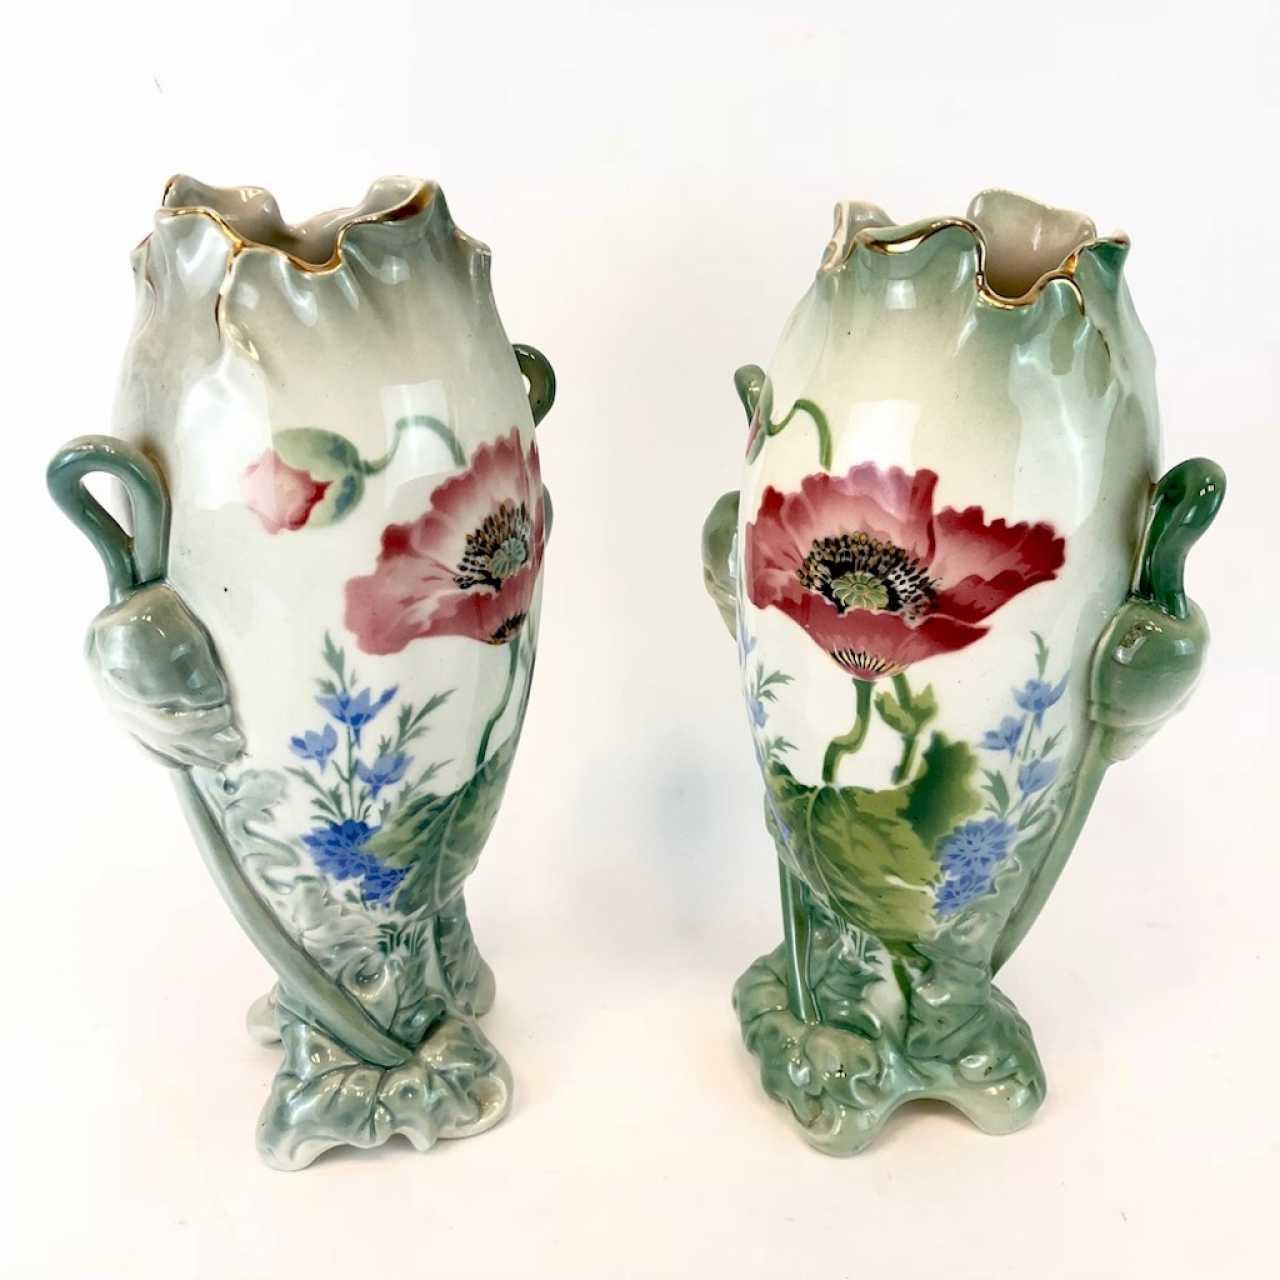 Art Nouveau Inspired California Poppy By Mason Larose: Auction Pair Of Art Nouveau Style Vases: Decor, Poppies